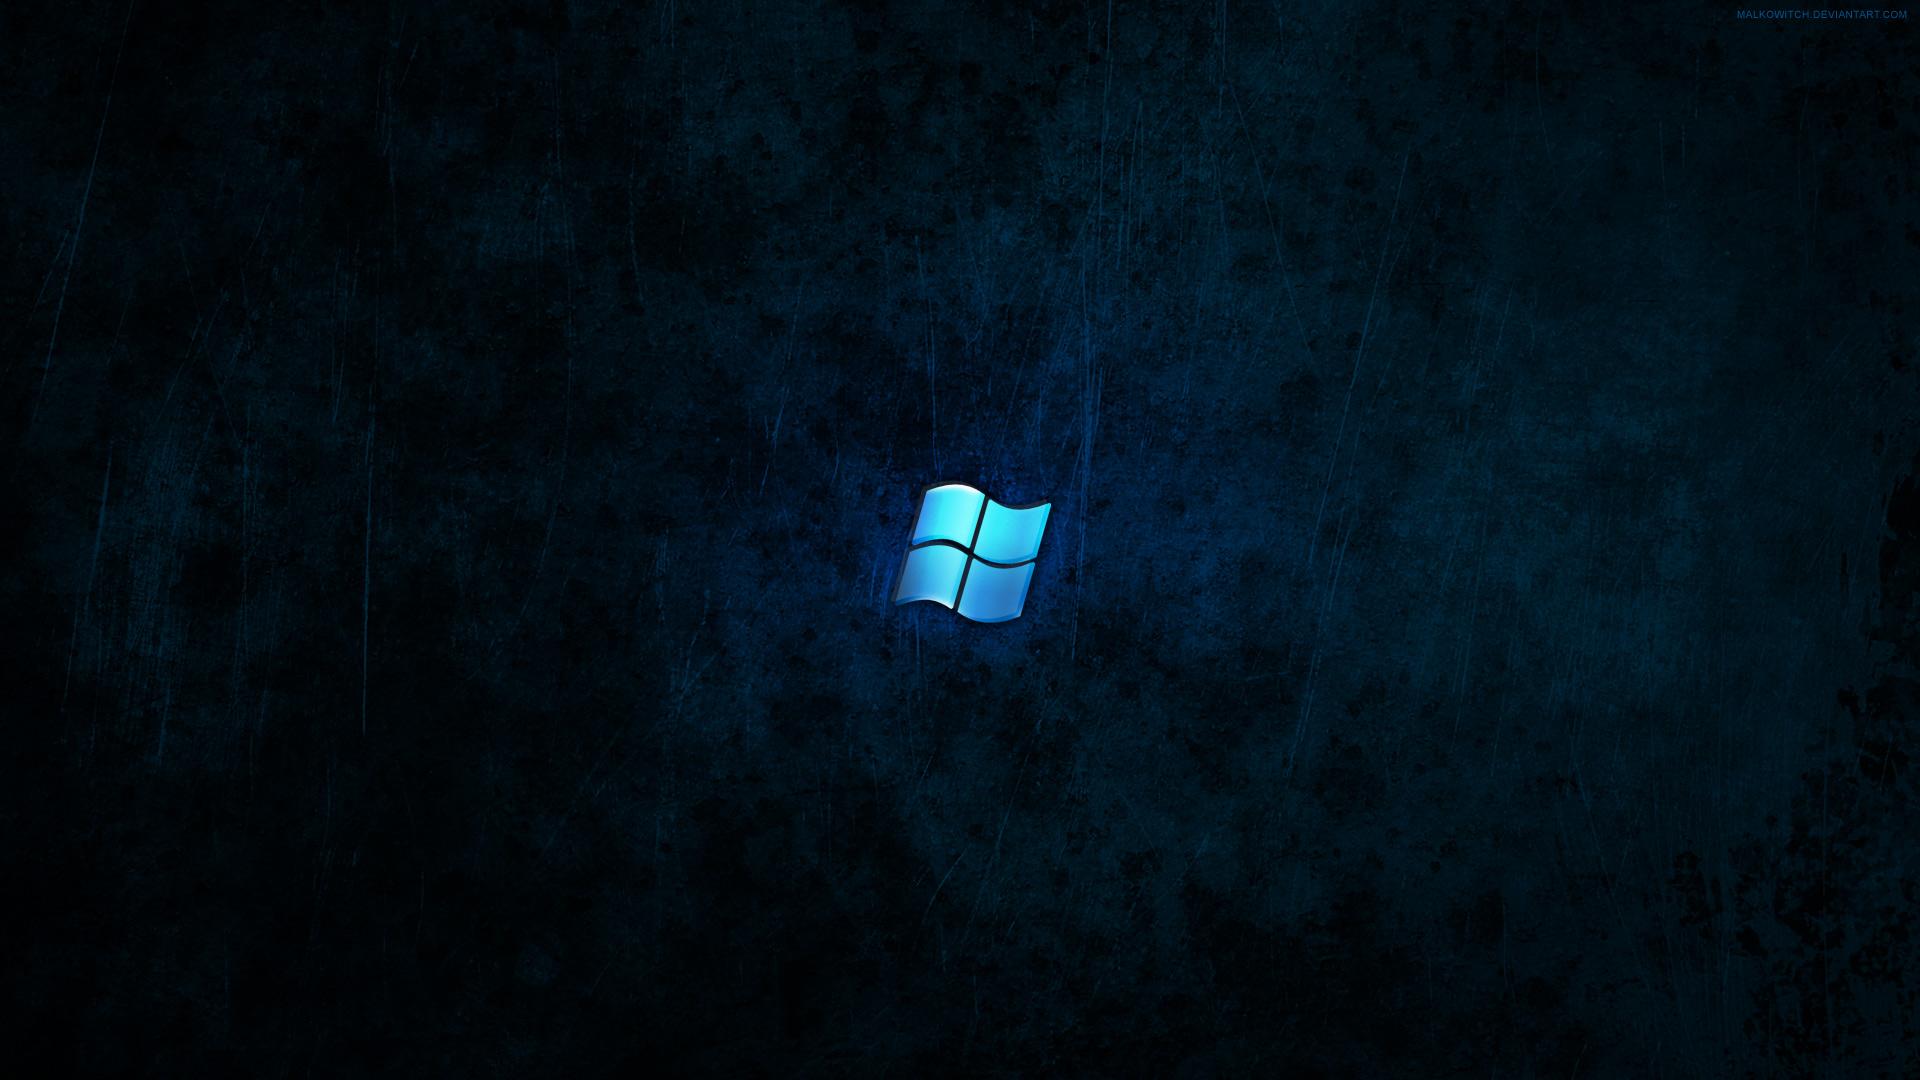 windows dark blue wallpaper by malkowitch customization wallpaper 1920x1080